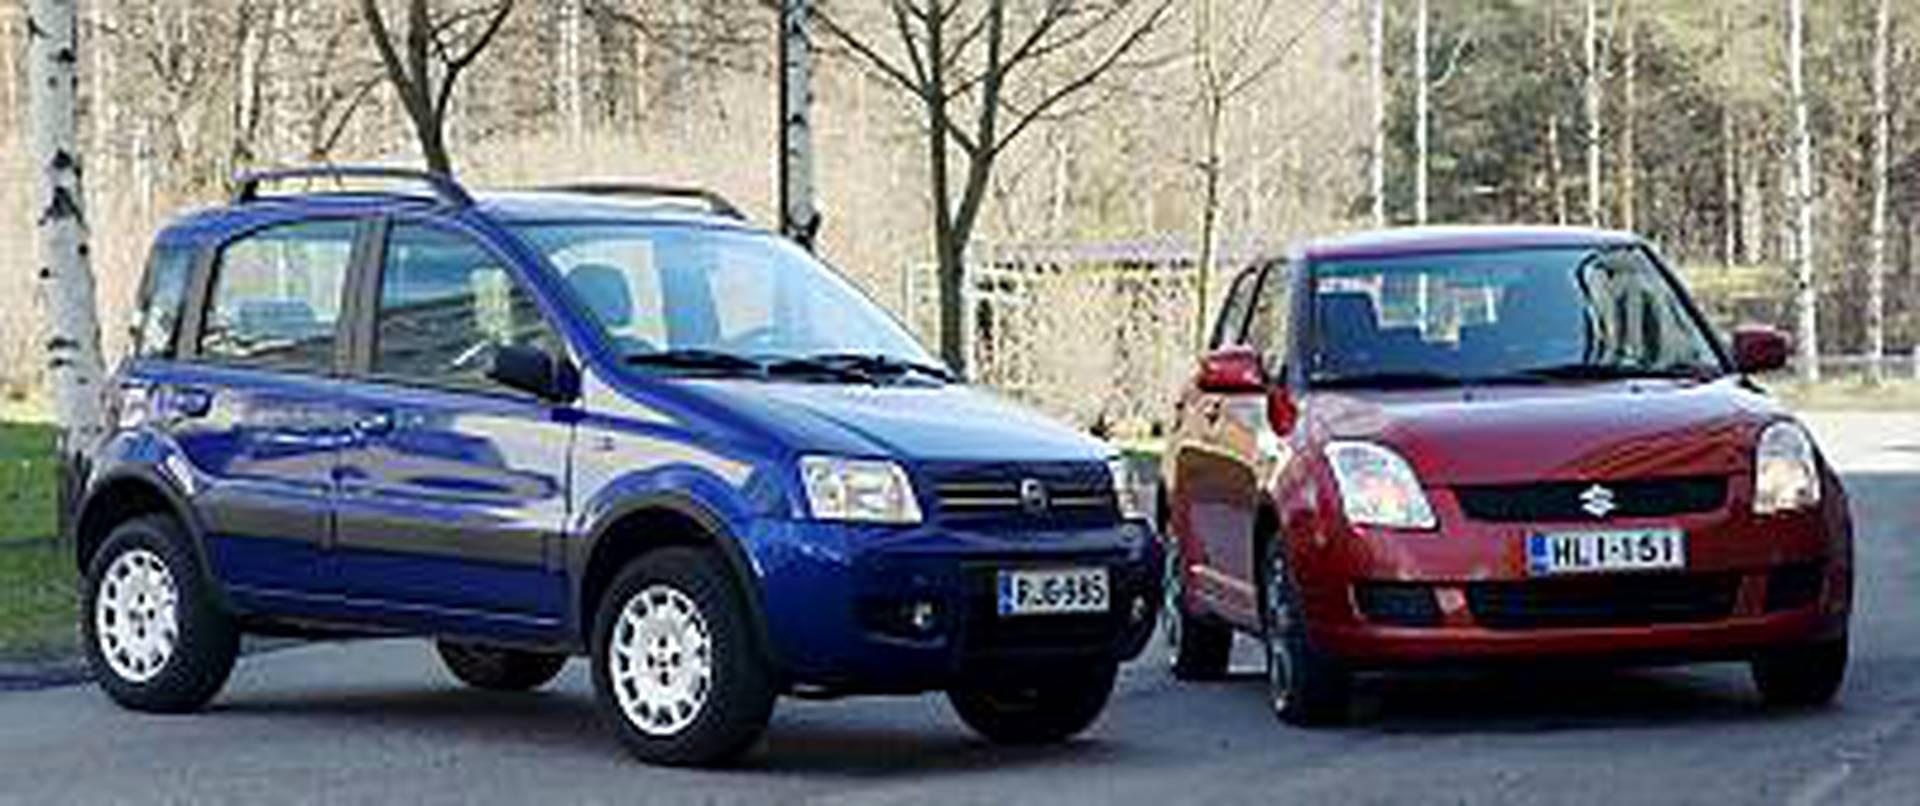 Fiat Panda 4x4 >> Fiat Panda 4x4 Suzuki Swift 4x4 Pienen Pienet Nelivedot